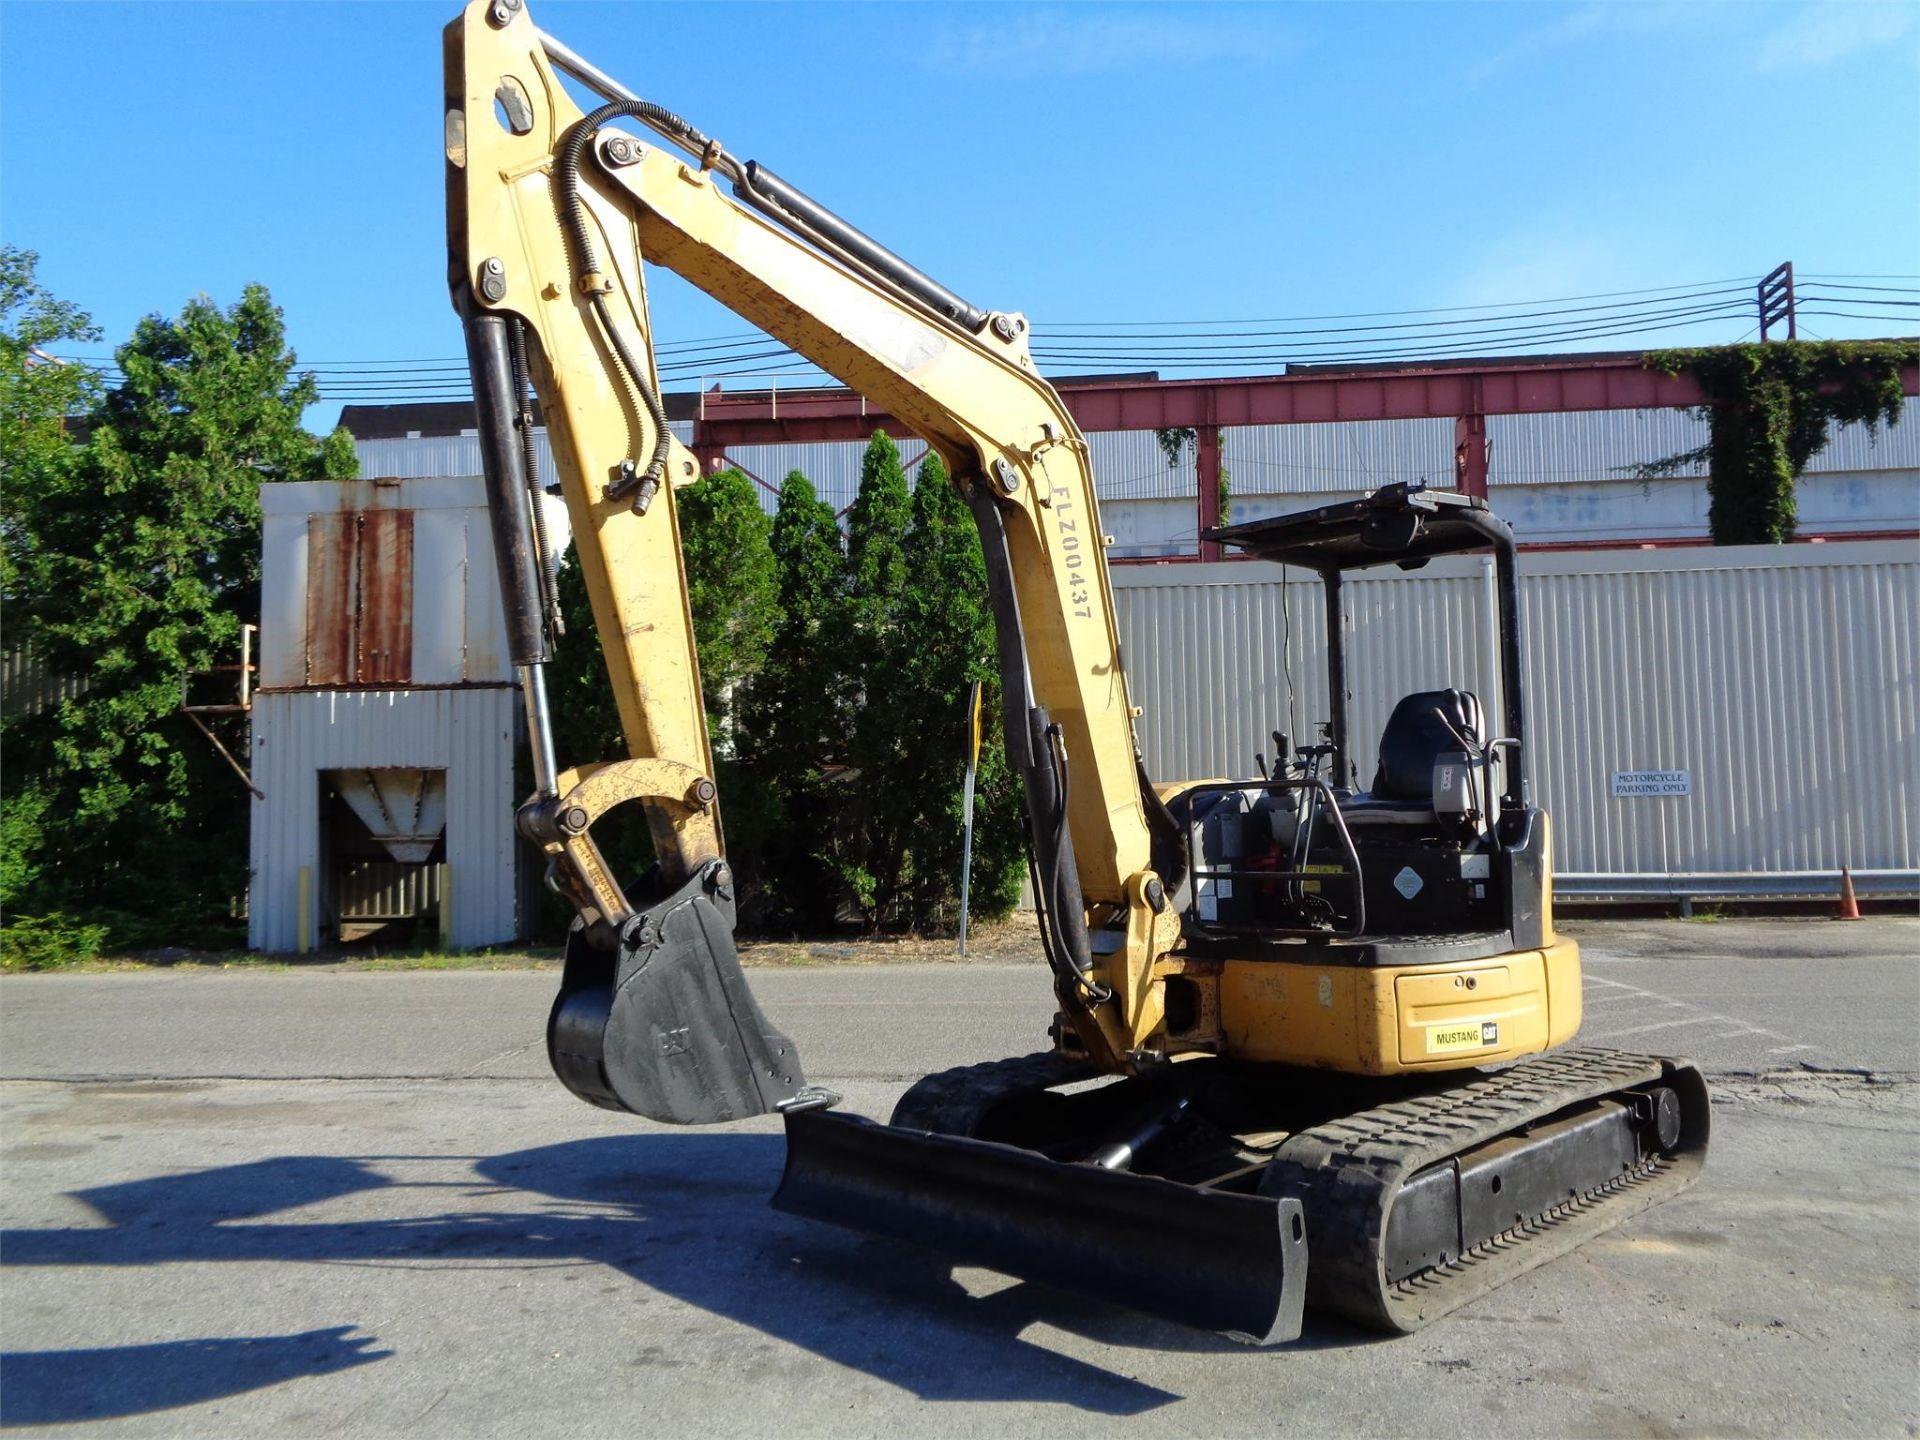 Lot 34 - 2011 Caterpillar 305.5D CR Mini Hydraulic Excavator